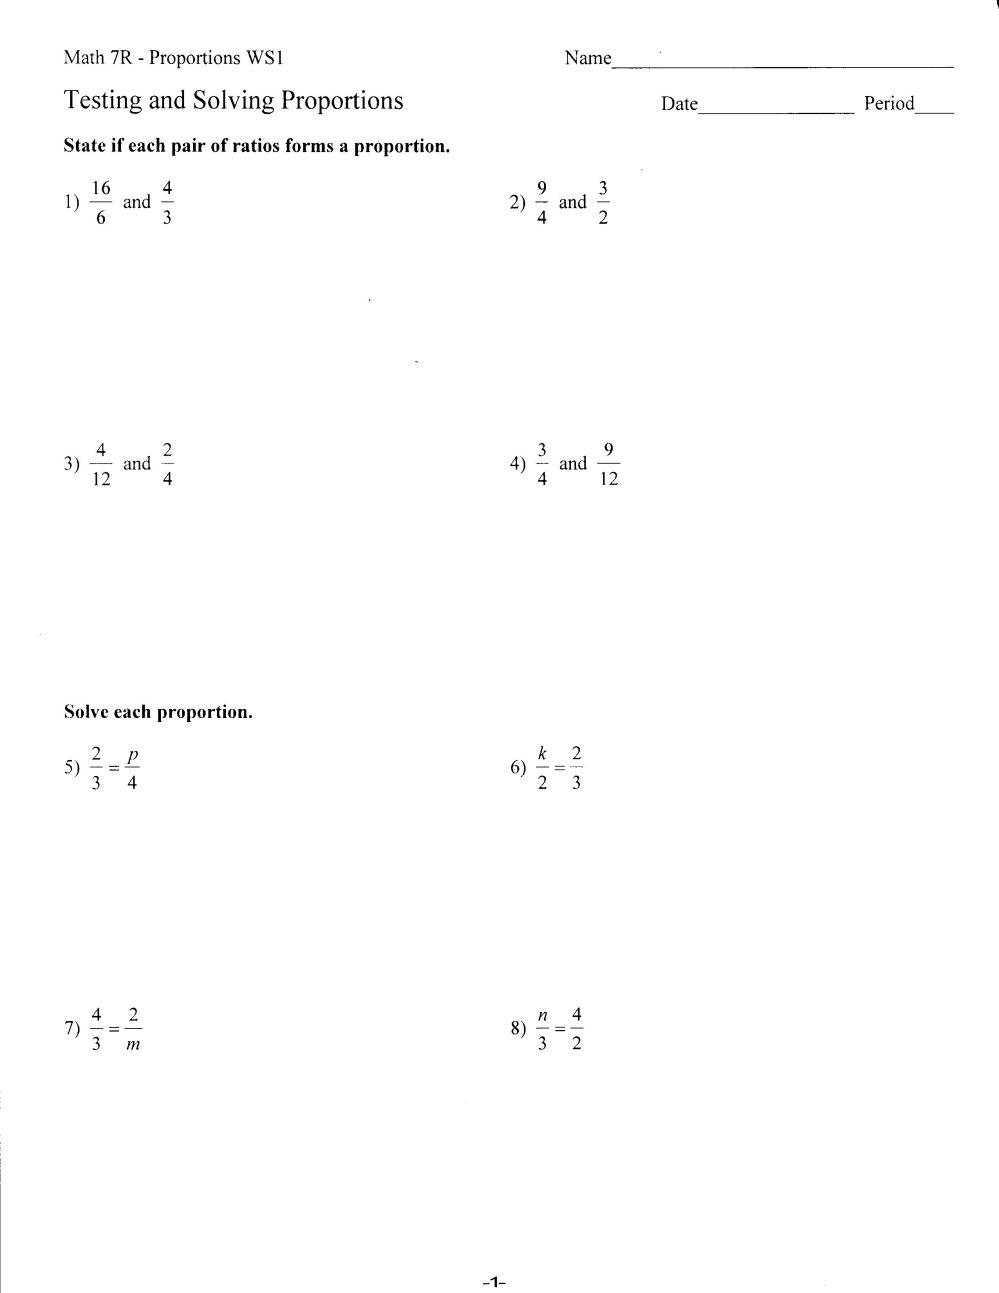 medium resolution of Worksheets - Mrs. Lay's Webpage 2011-12